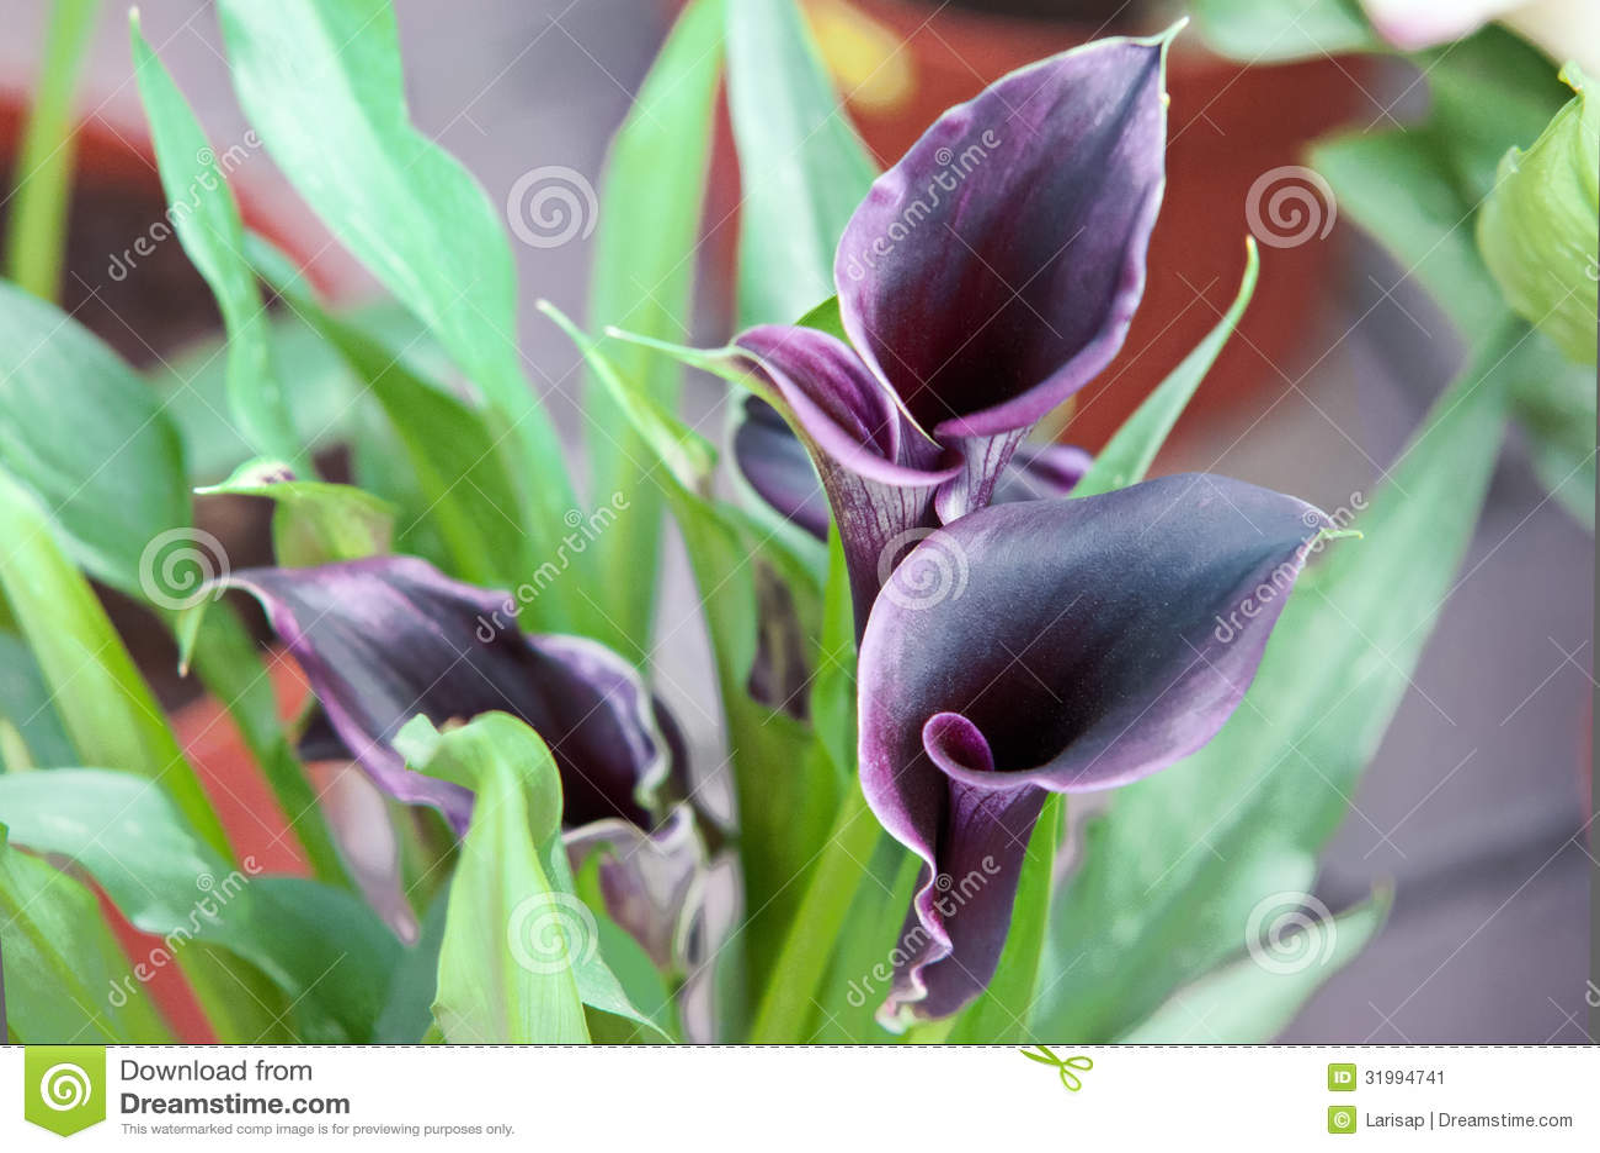 Elegant purple calla lily stock image image of life bloom 31994741 download comp izmirmasajfo